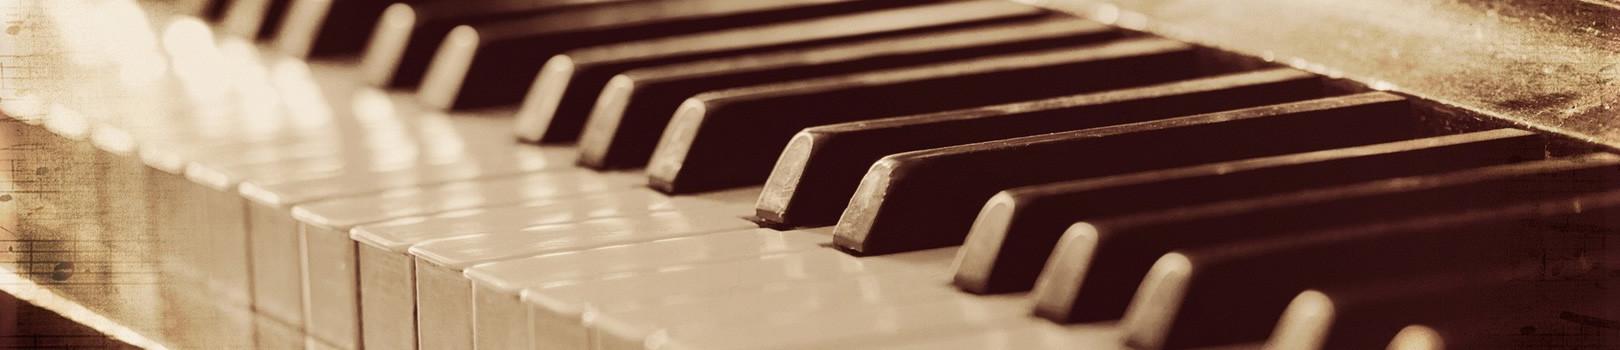 scuola-musica-greve-pianoforte